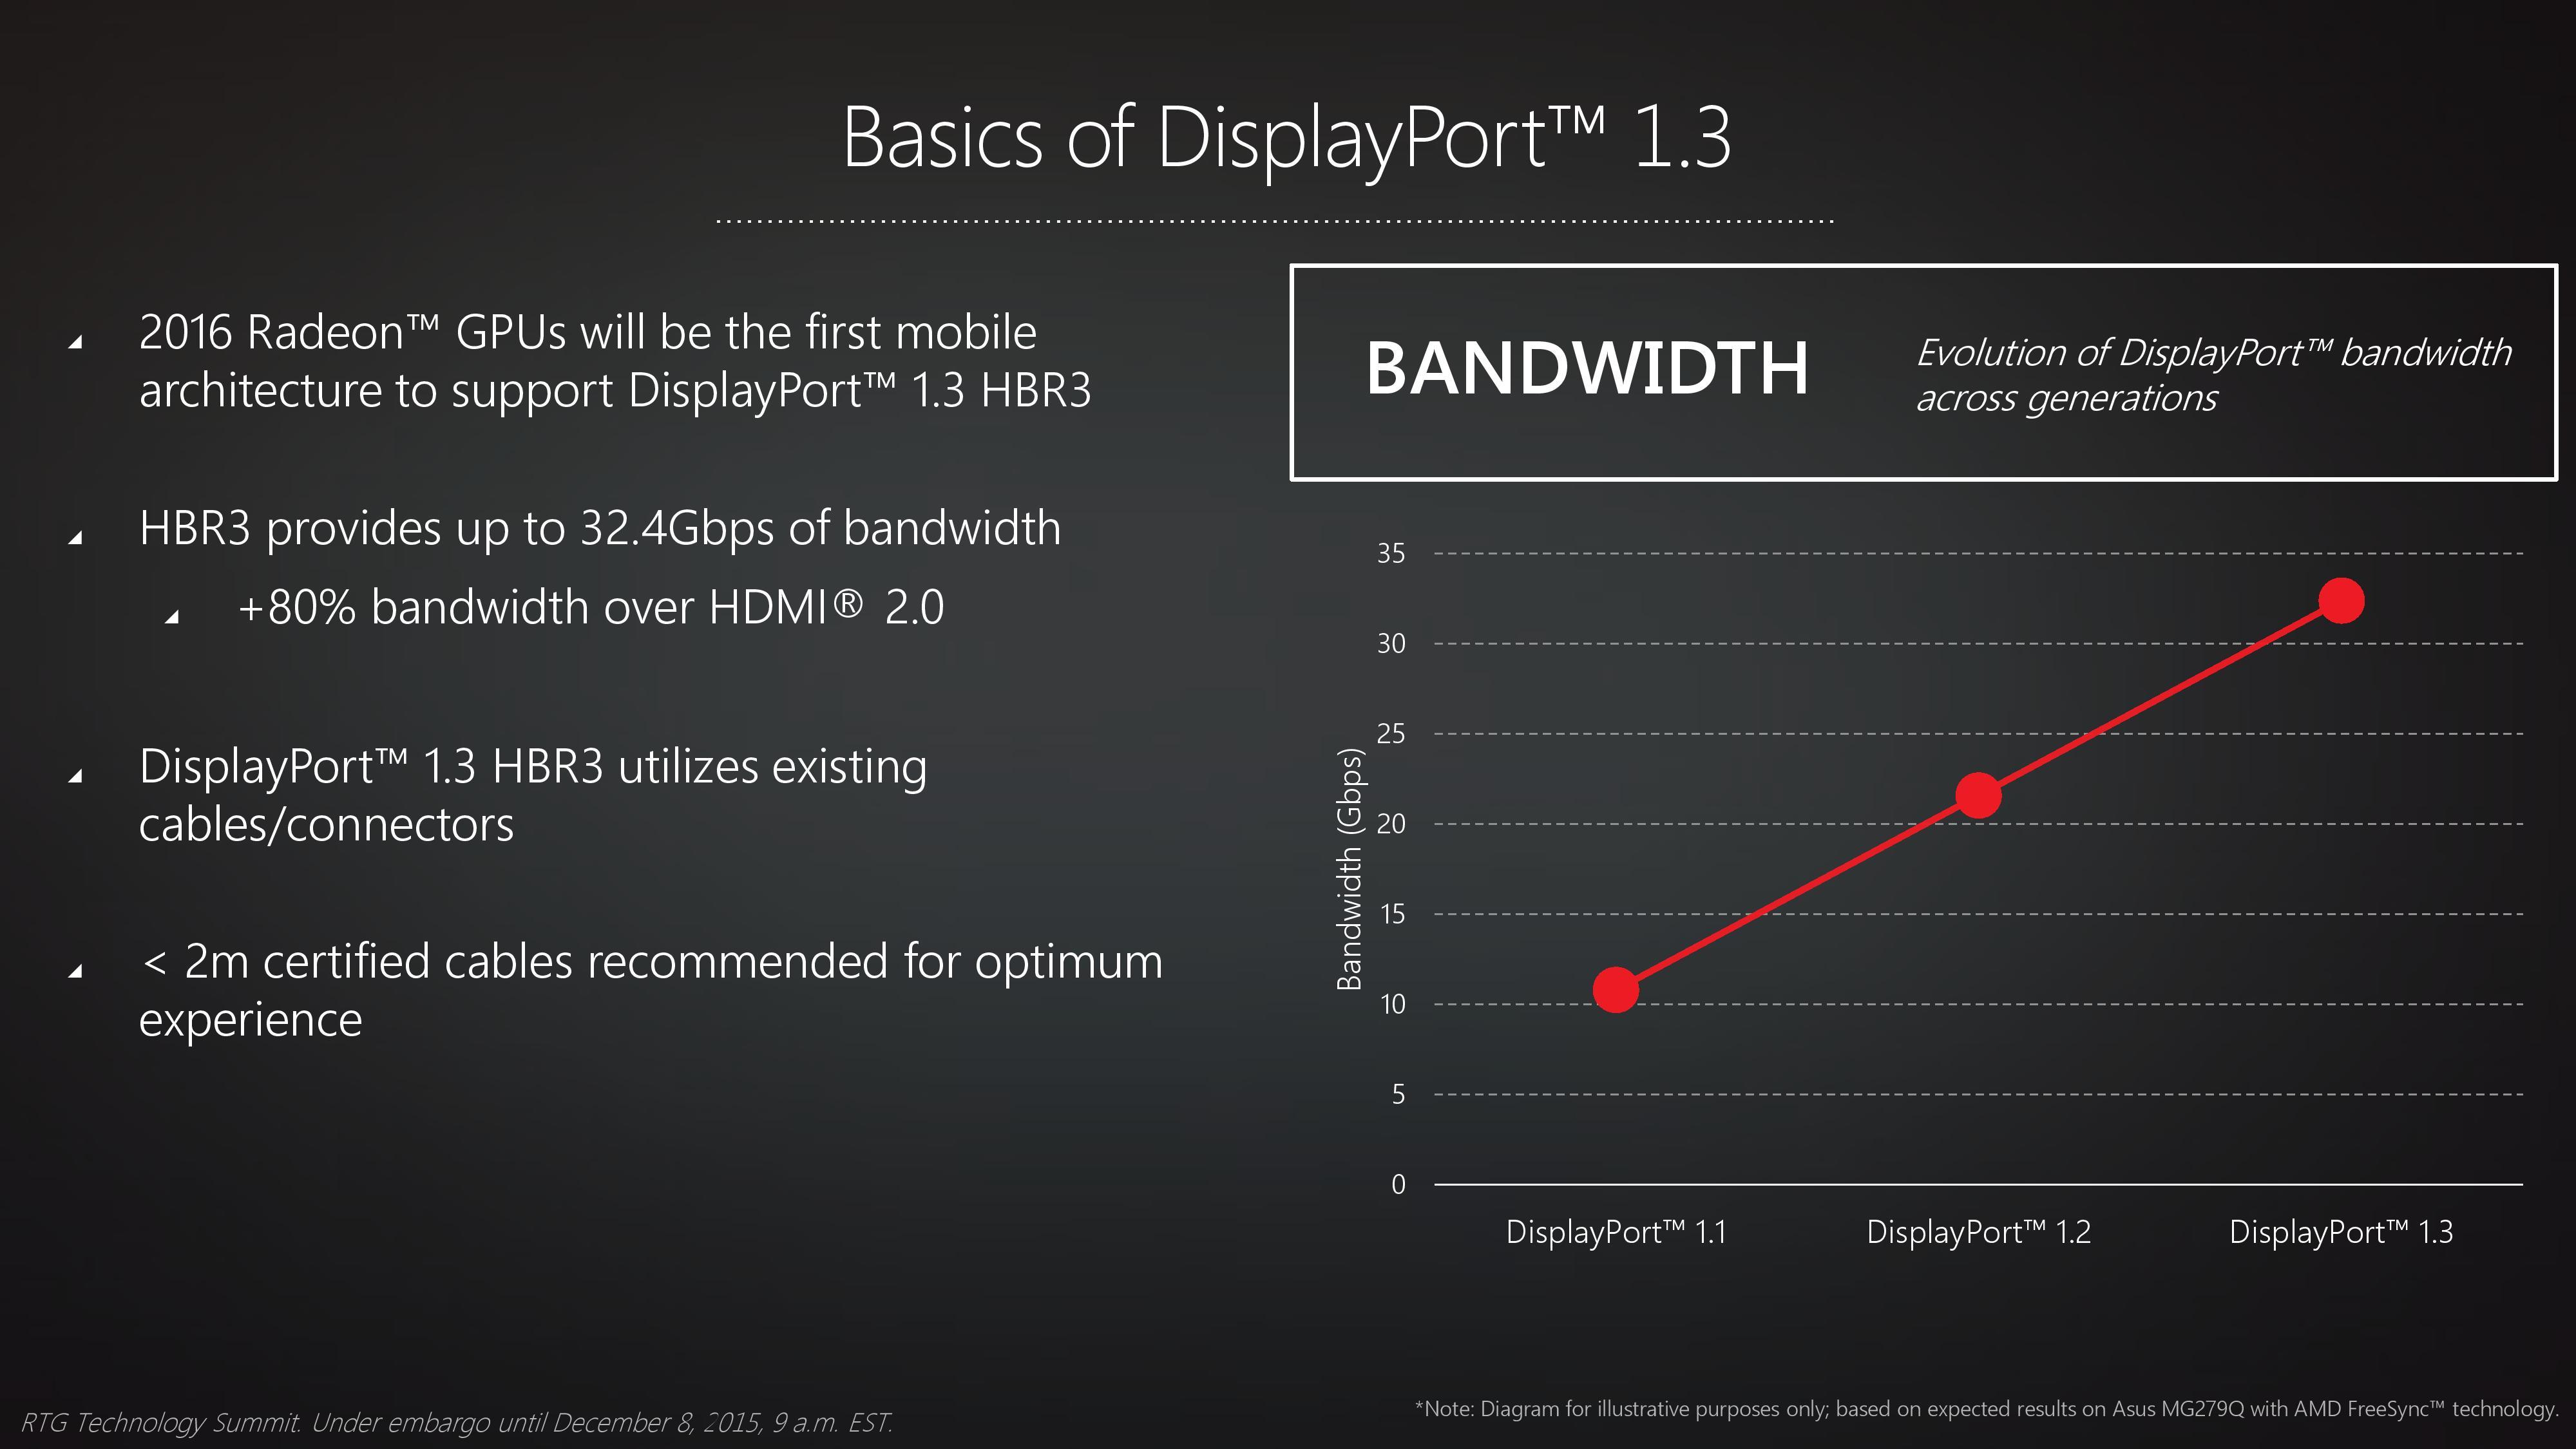 AMD Discusses 2016 Radeon Visual Technologies Roadmap